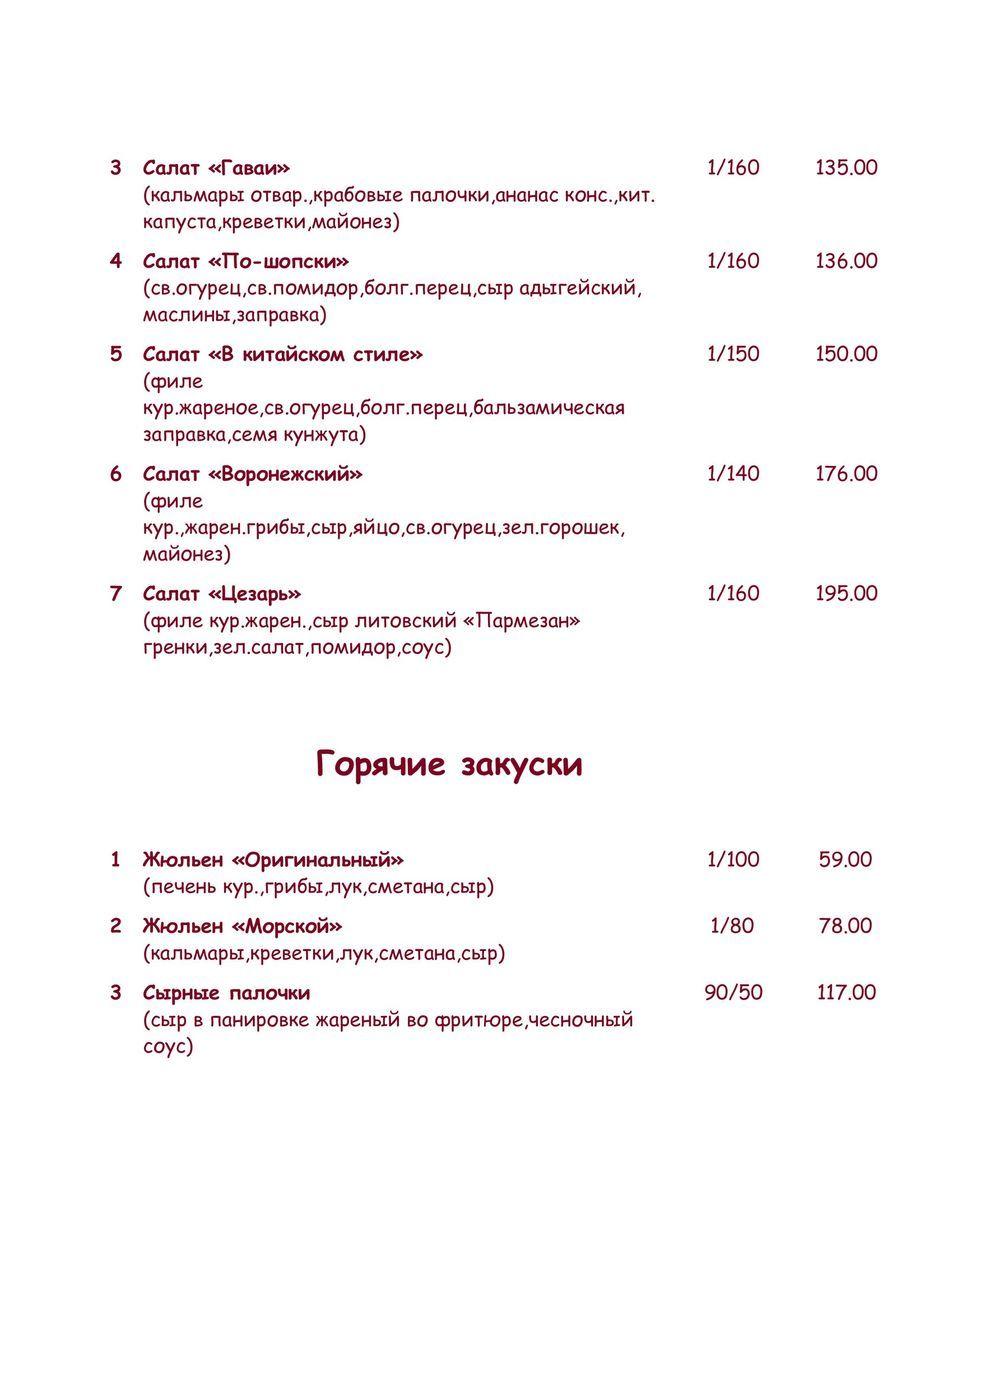 Меню кафе Мельба на улице Кирова фото 13